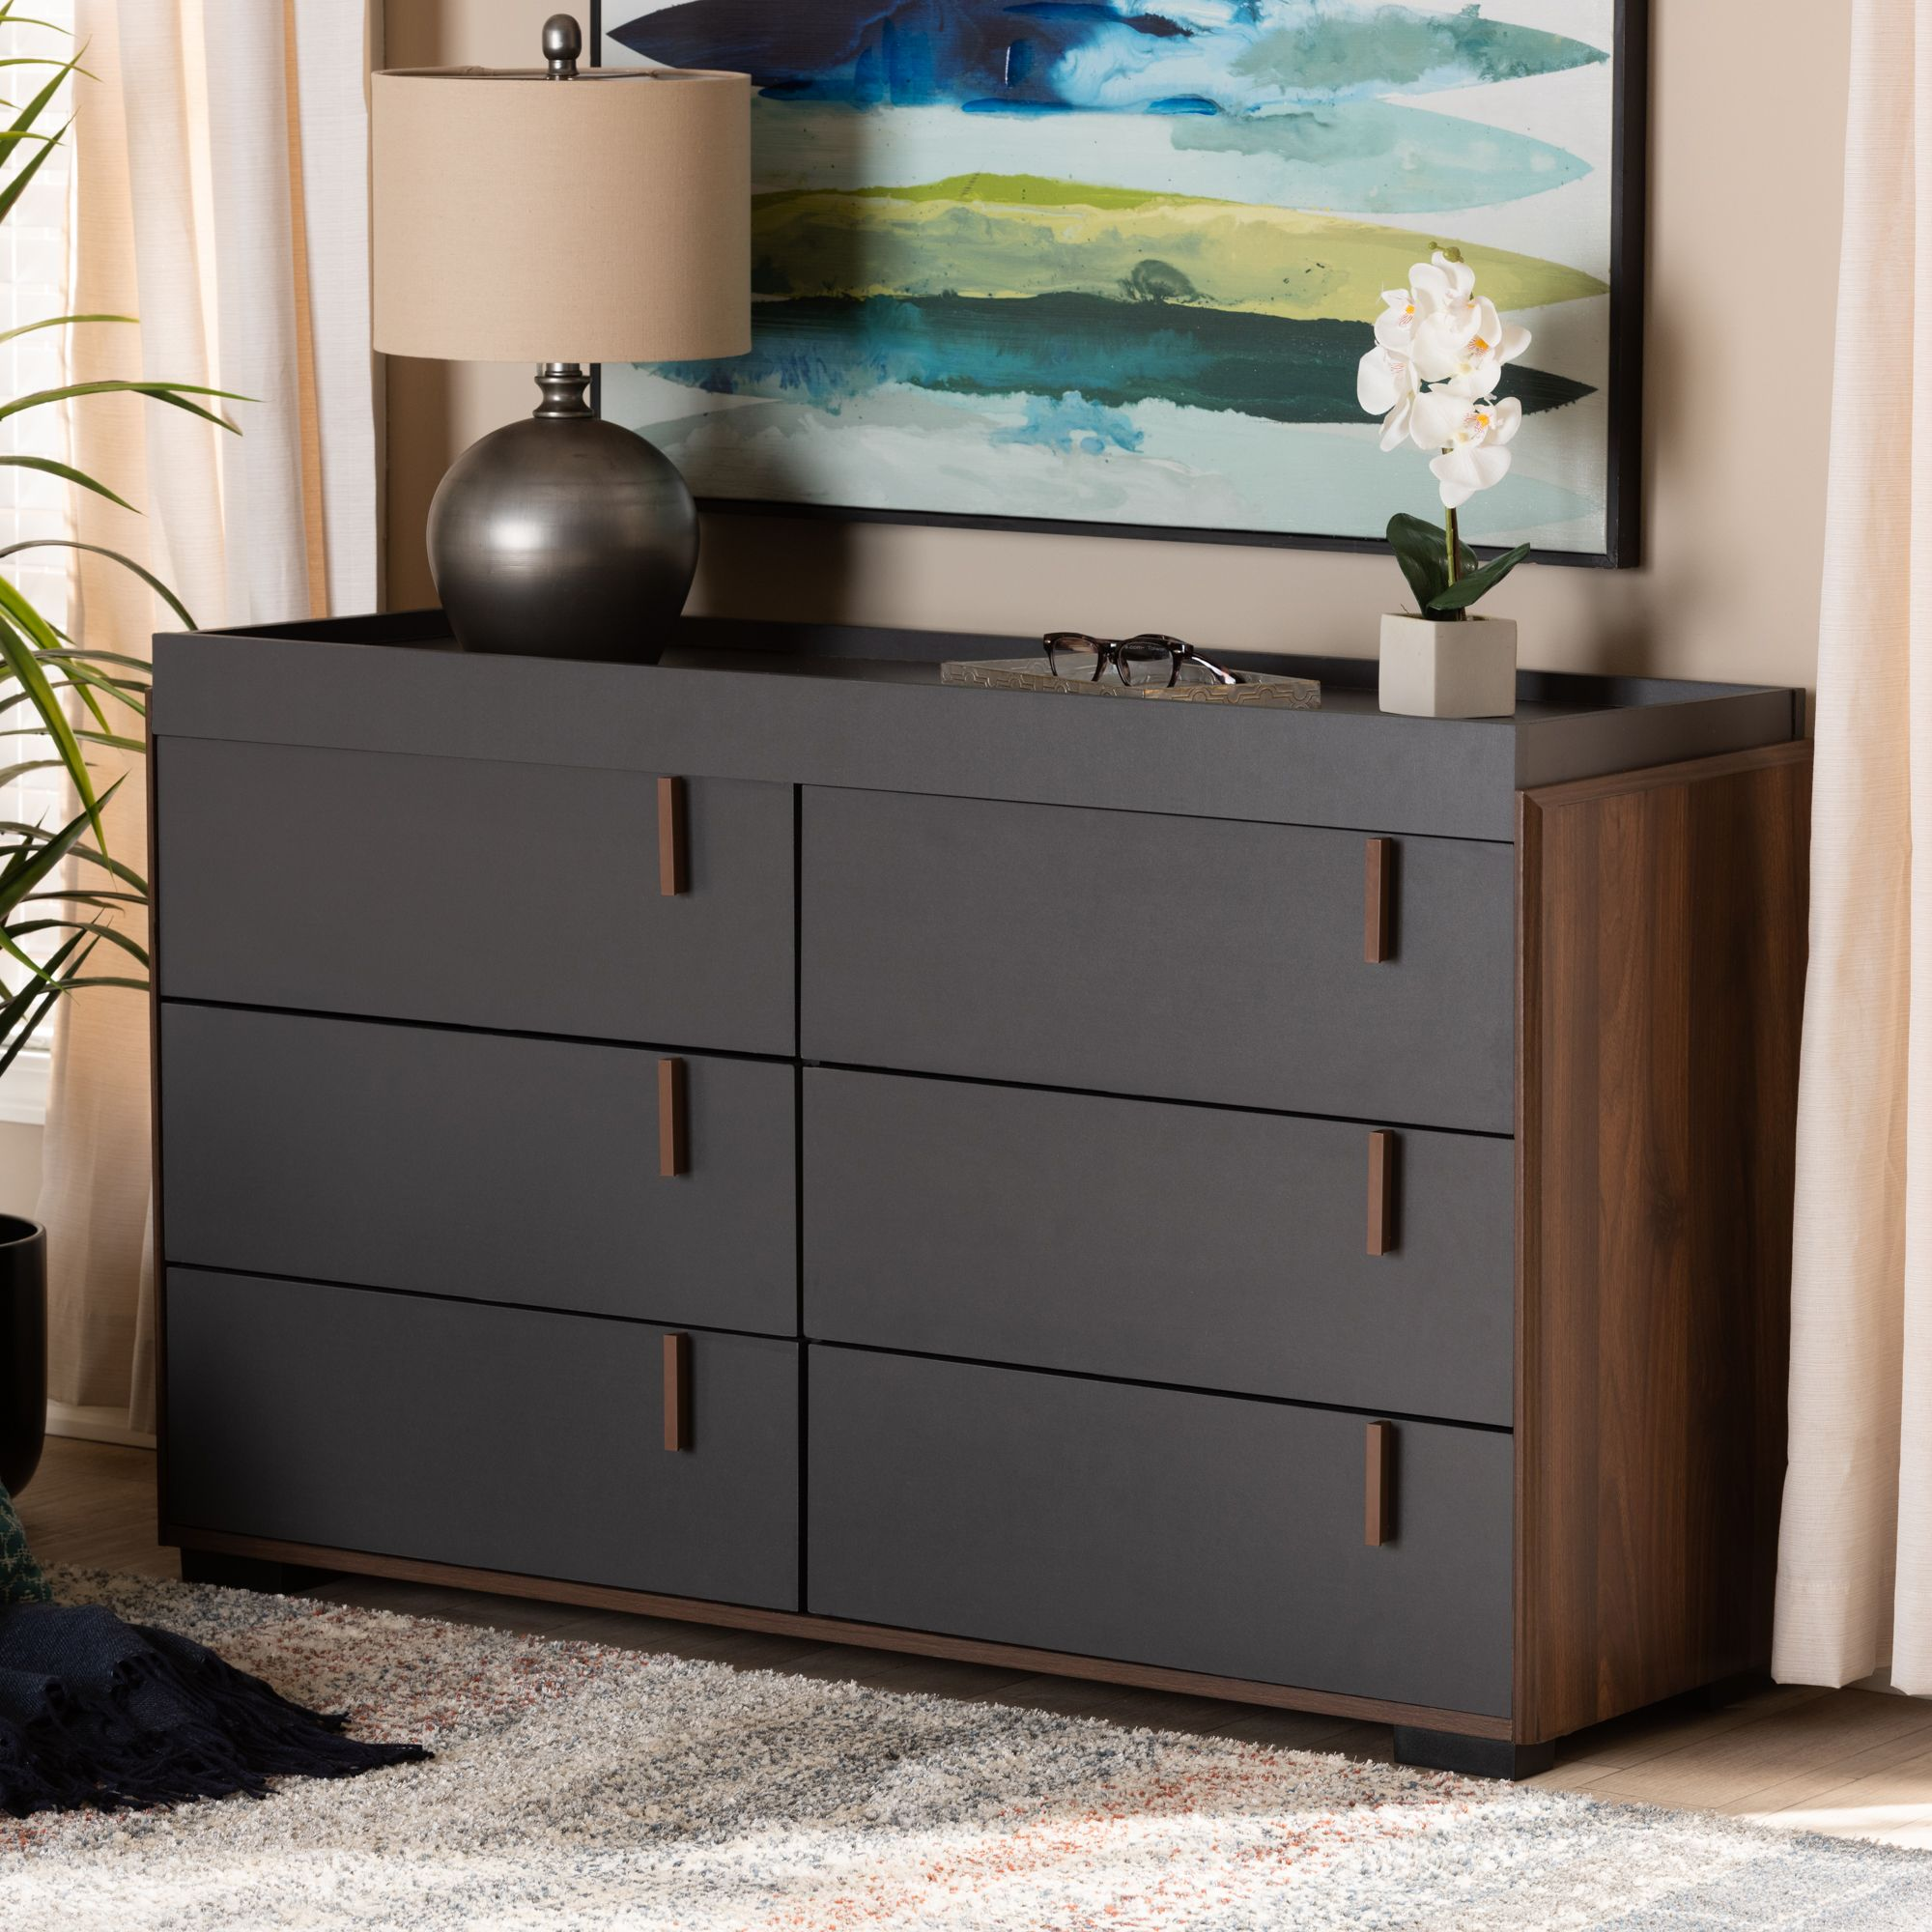 Walnut Finished Wood 6 Drawer Dresser